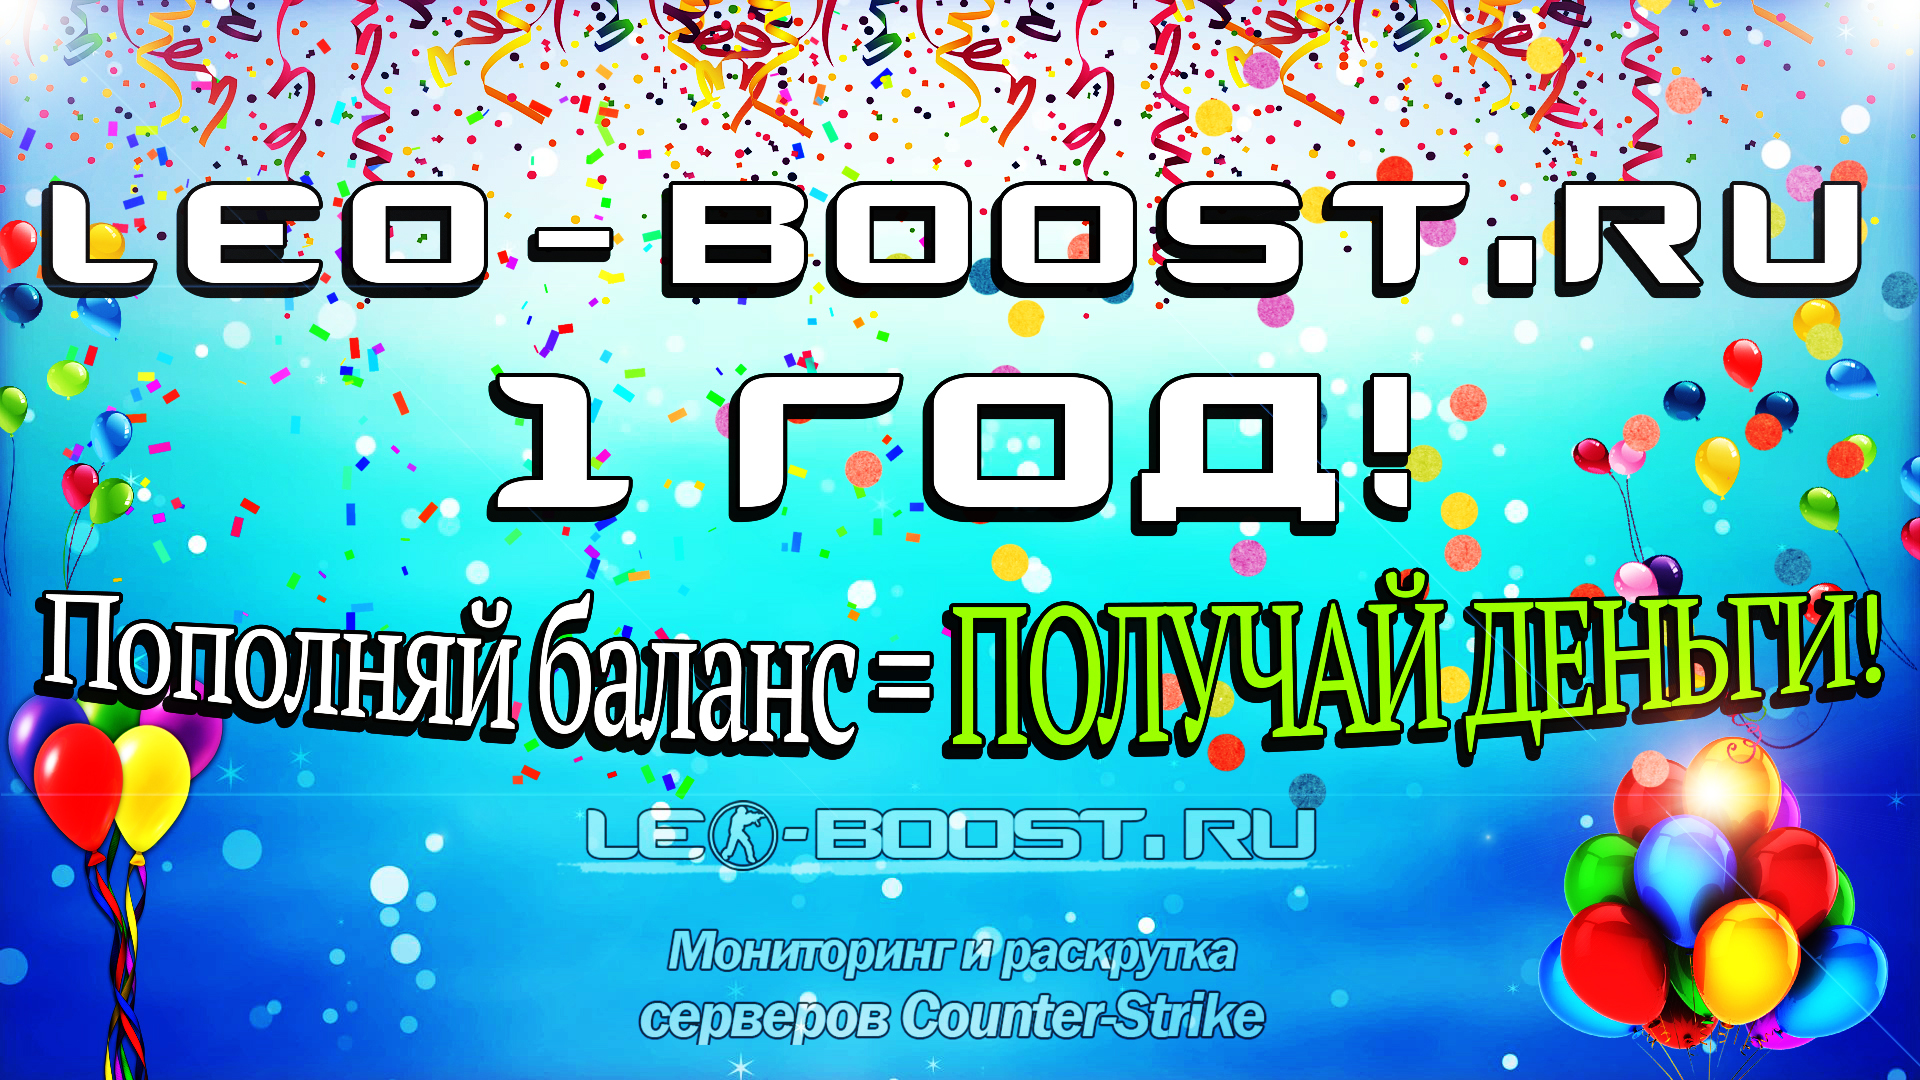 leo-boost - 1 год! БОНУСЫ!